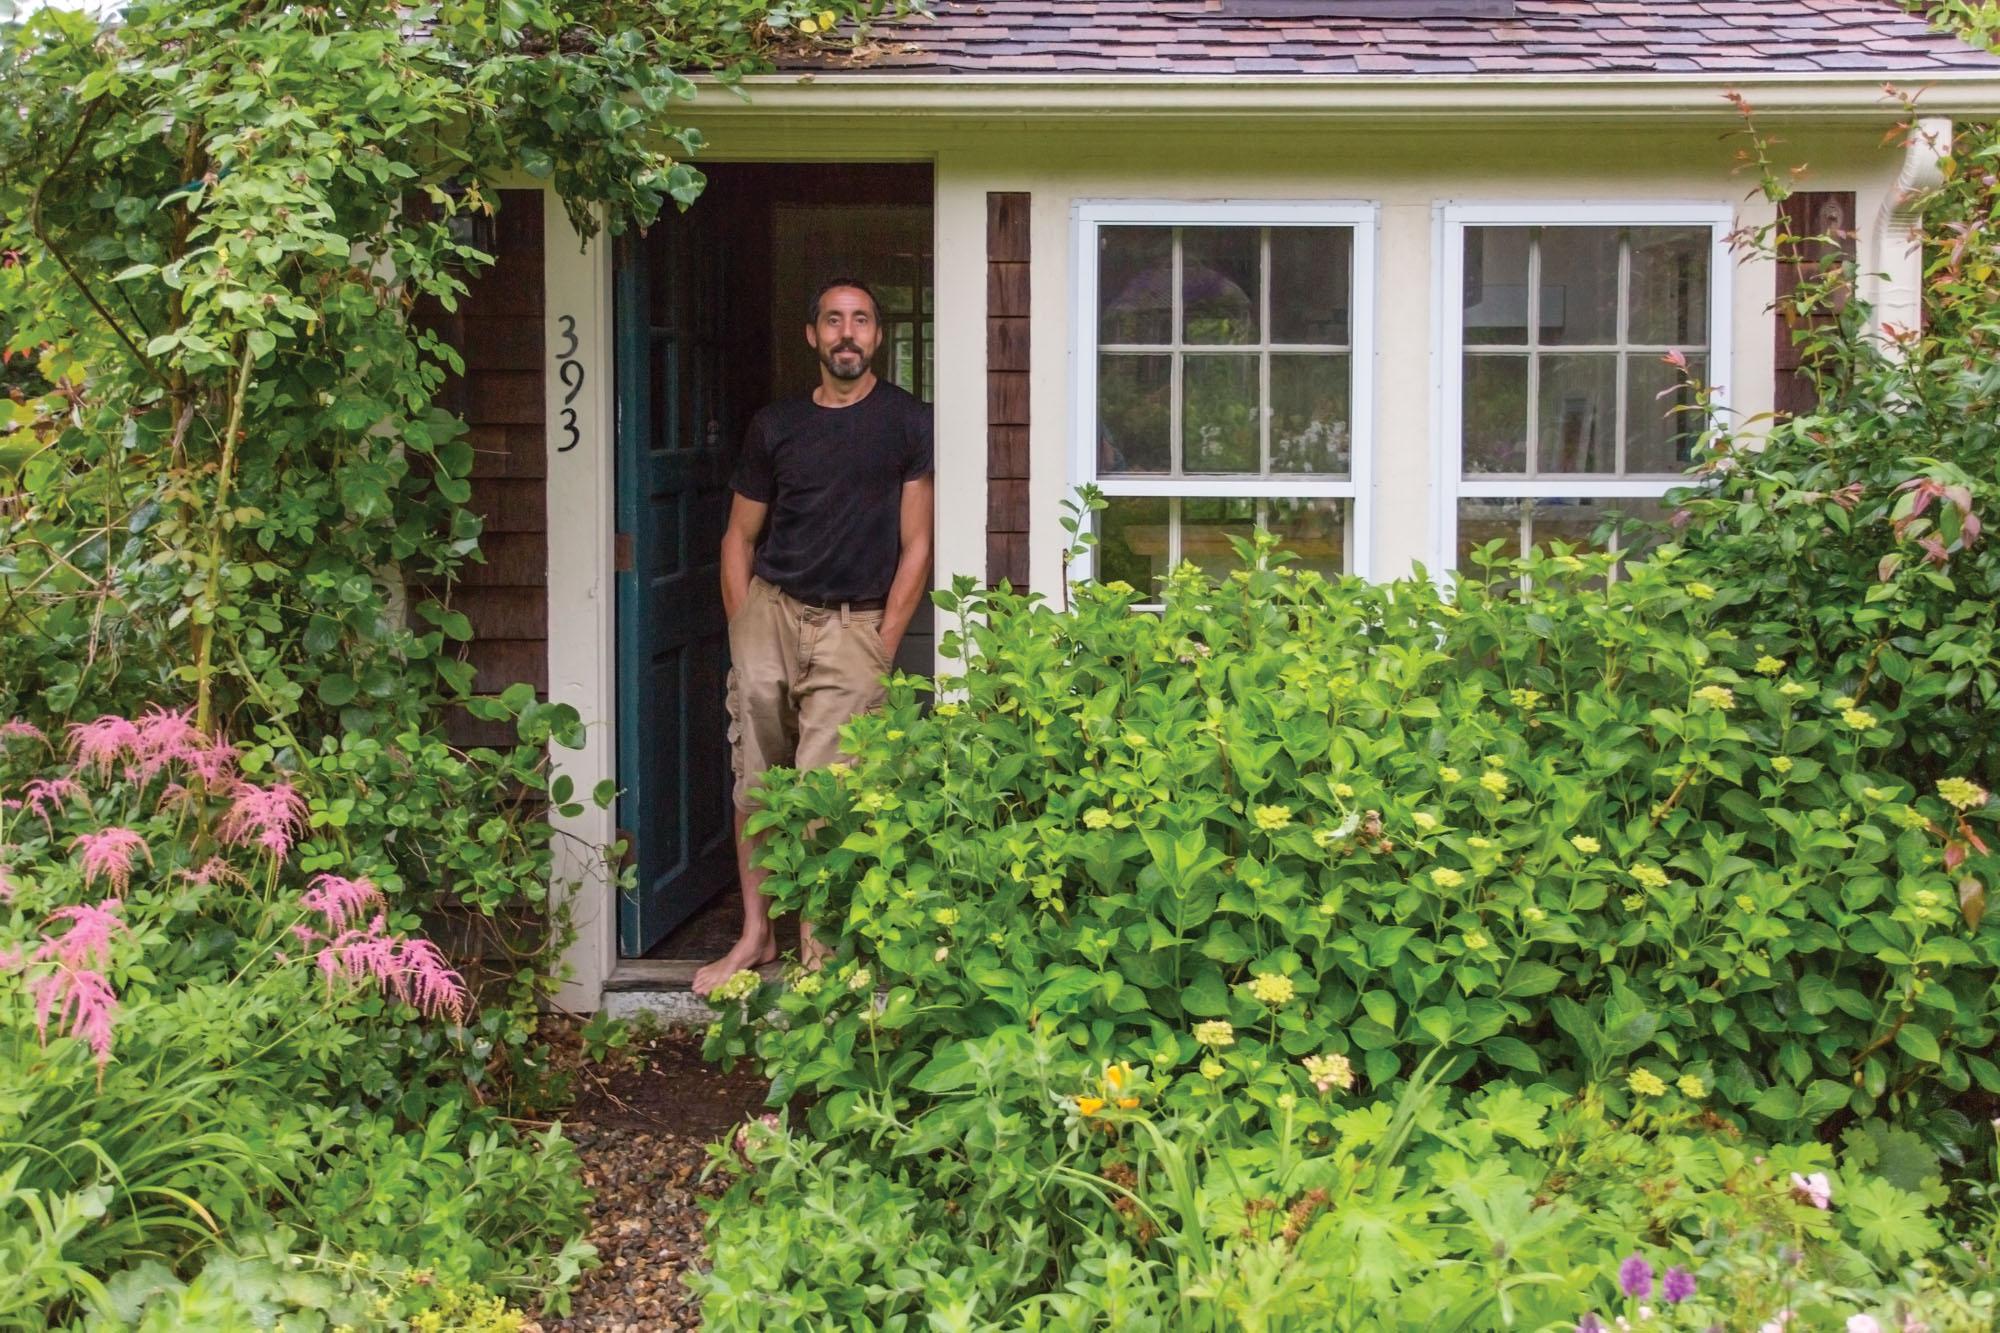 Garden designer Andrew Grossman